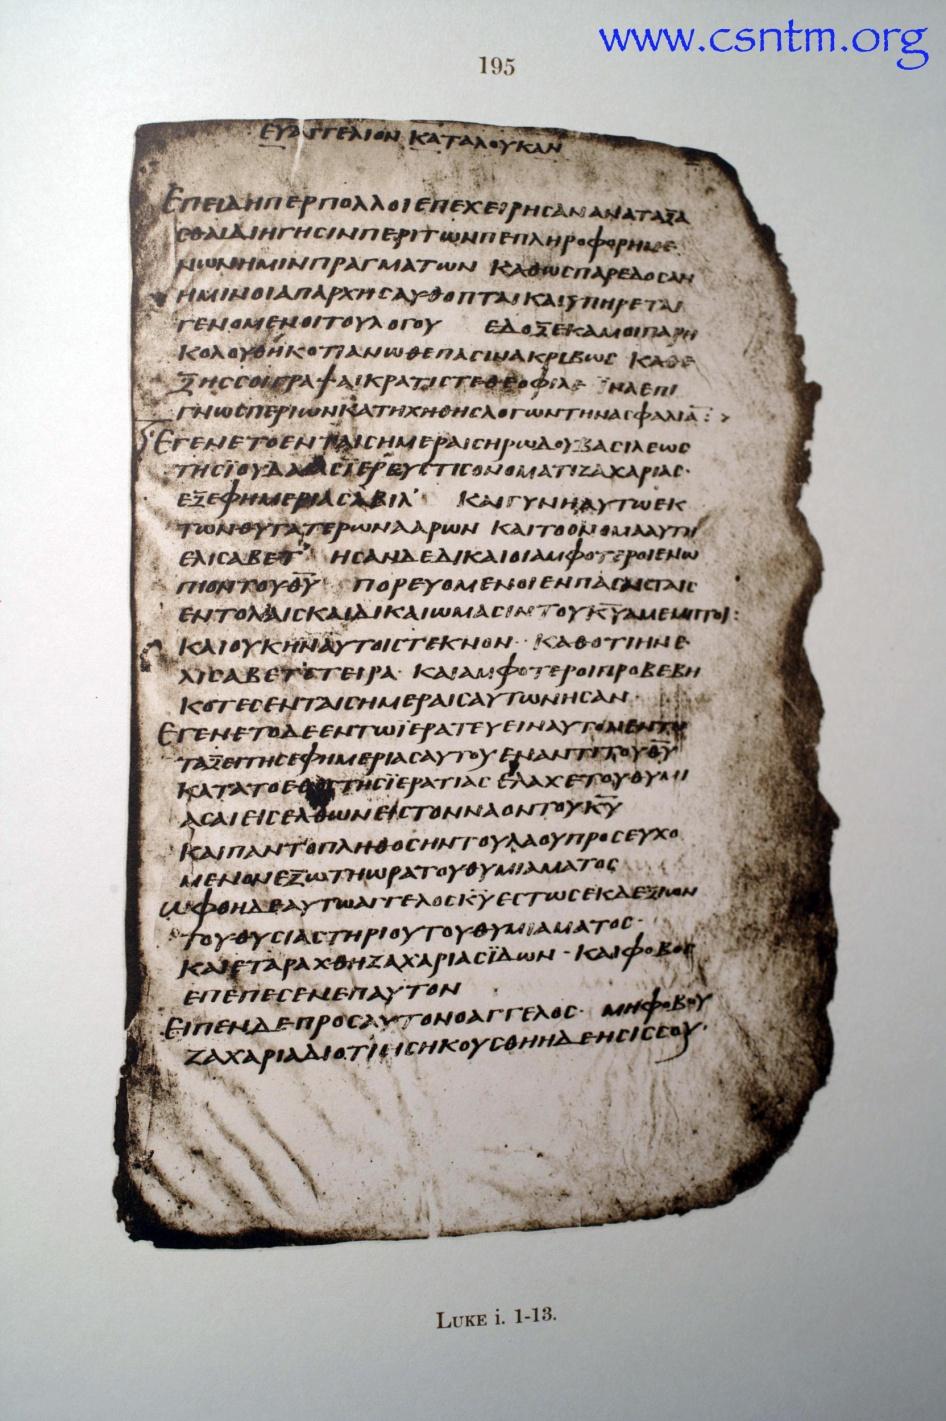 http://images.csntm.org/Manuscripts/GA_032/CodexW_105a.jpg